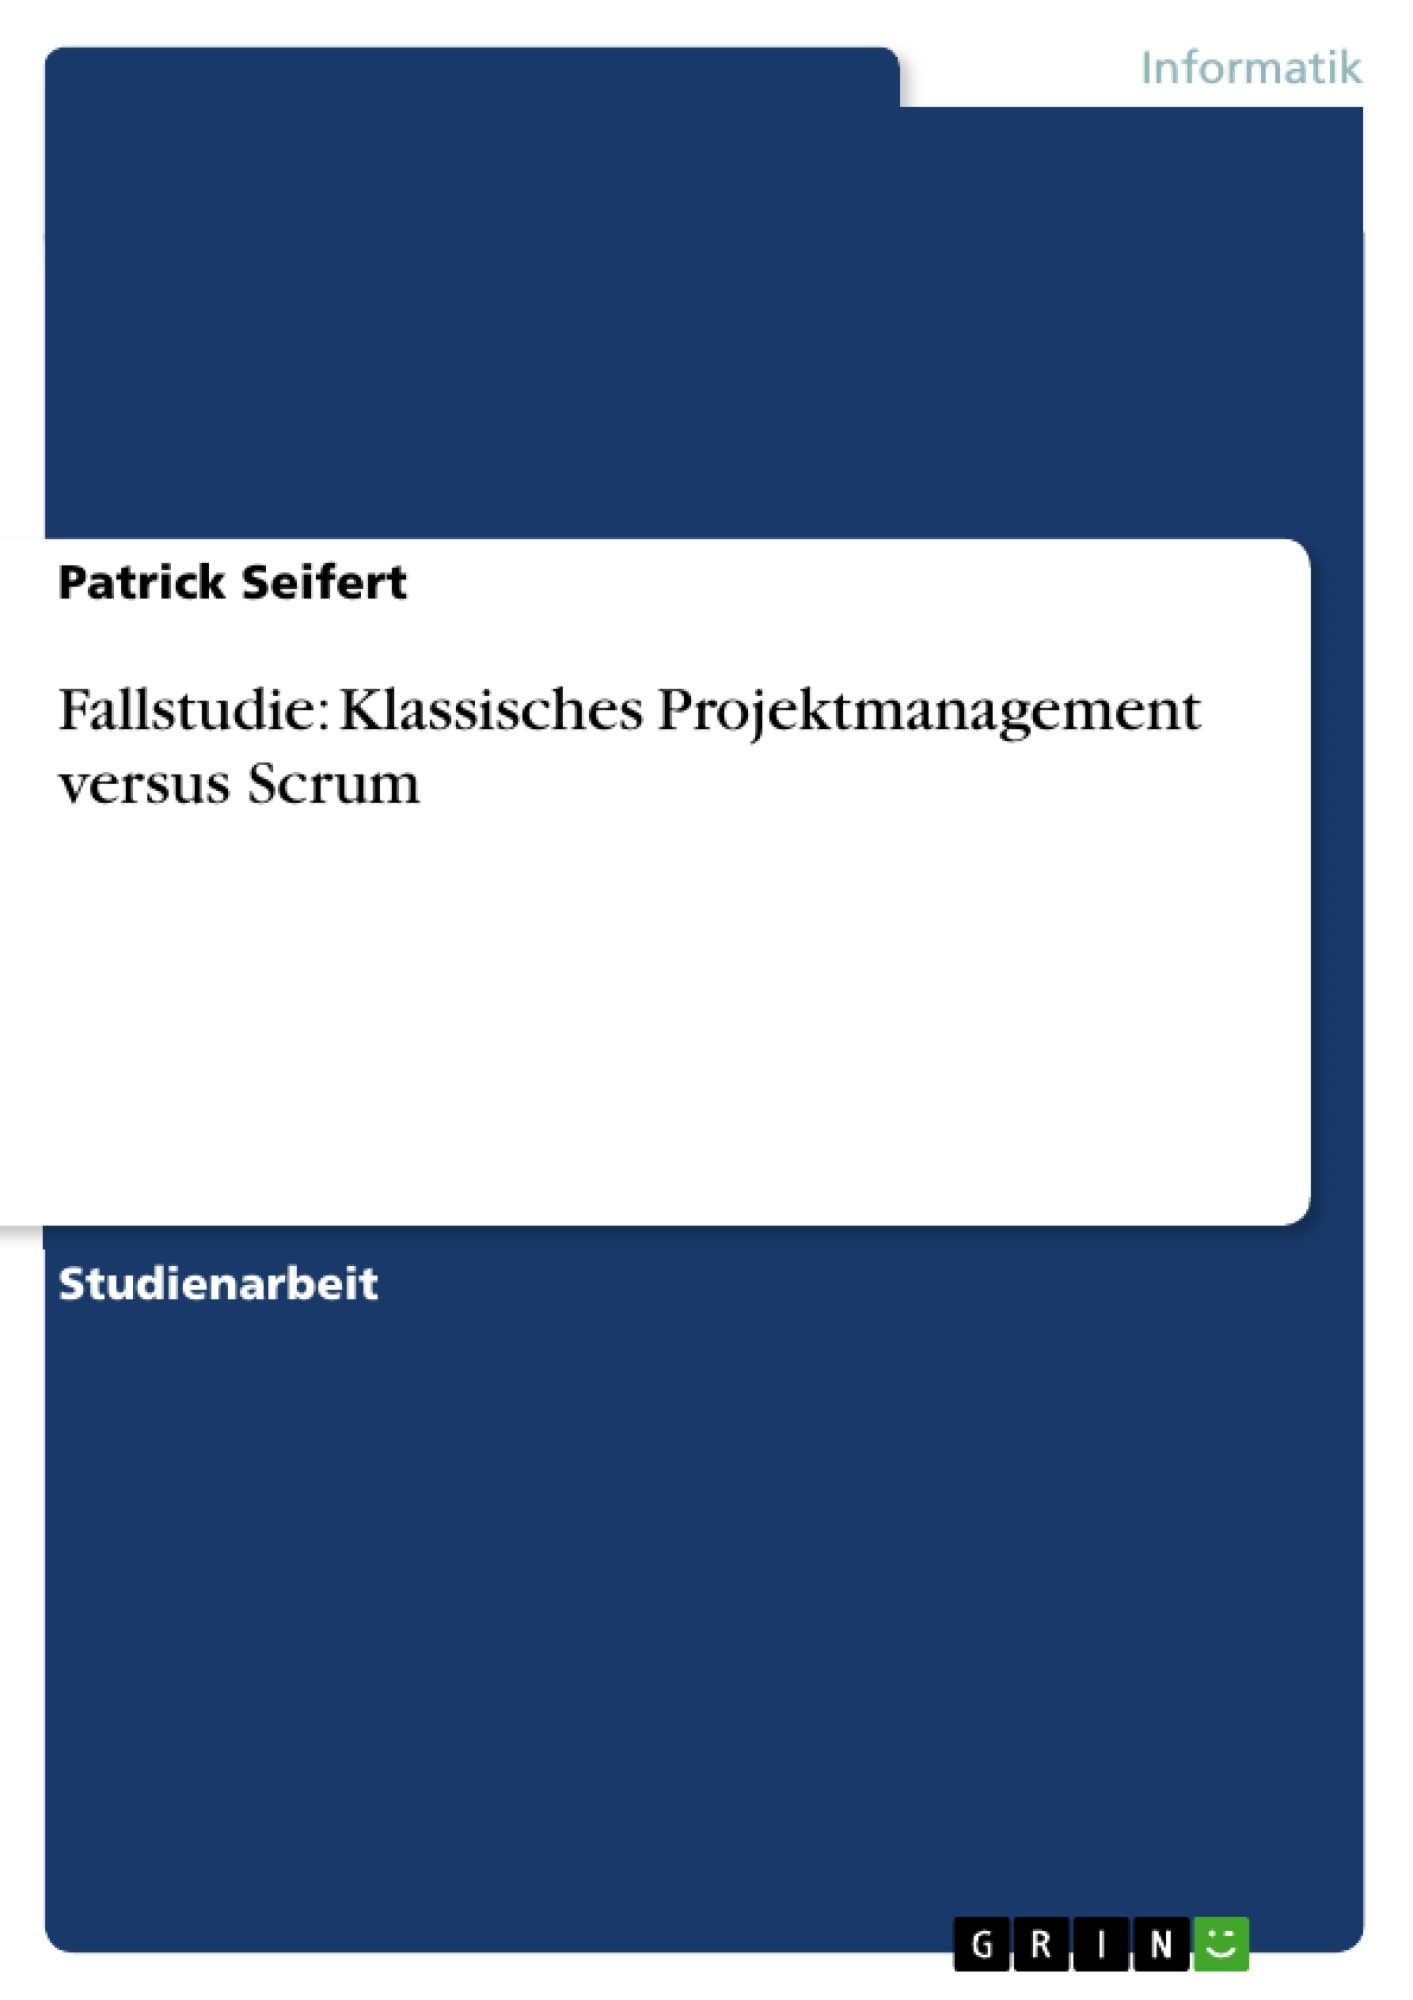 Titel: Fallstudie: Klassisches Projektmanagement versus Scrum